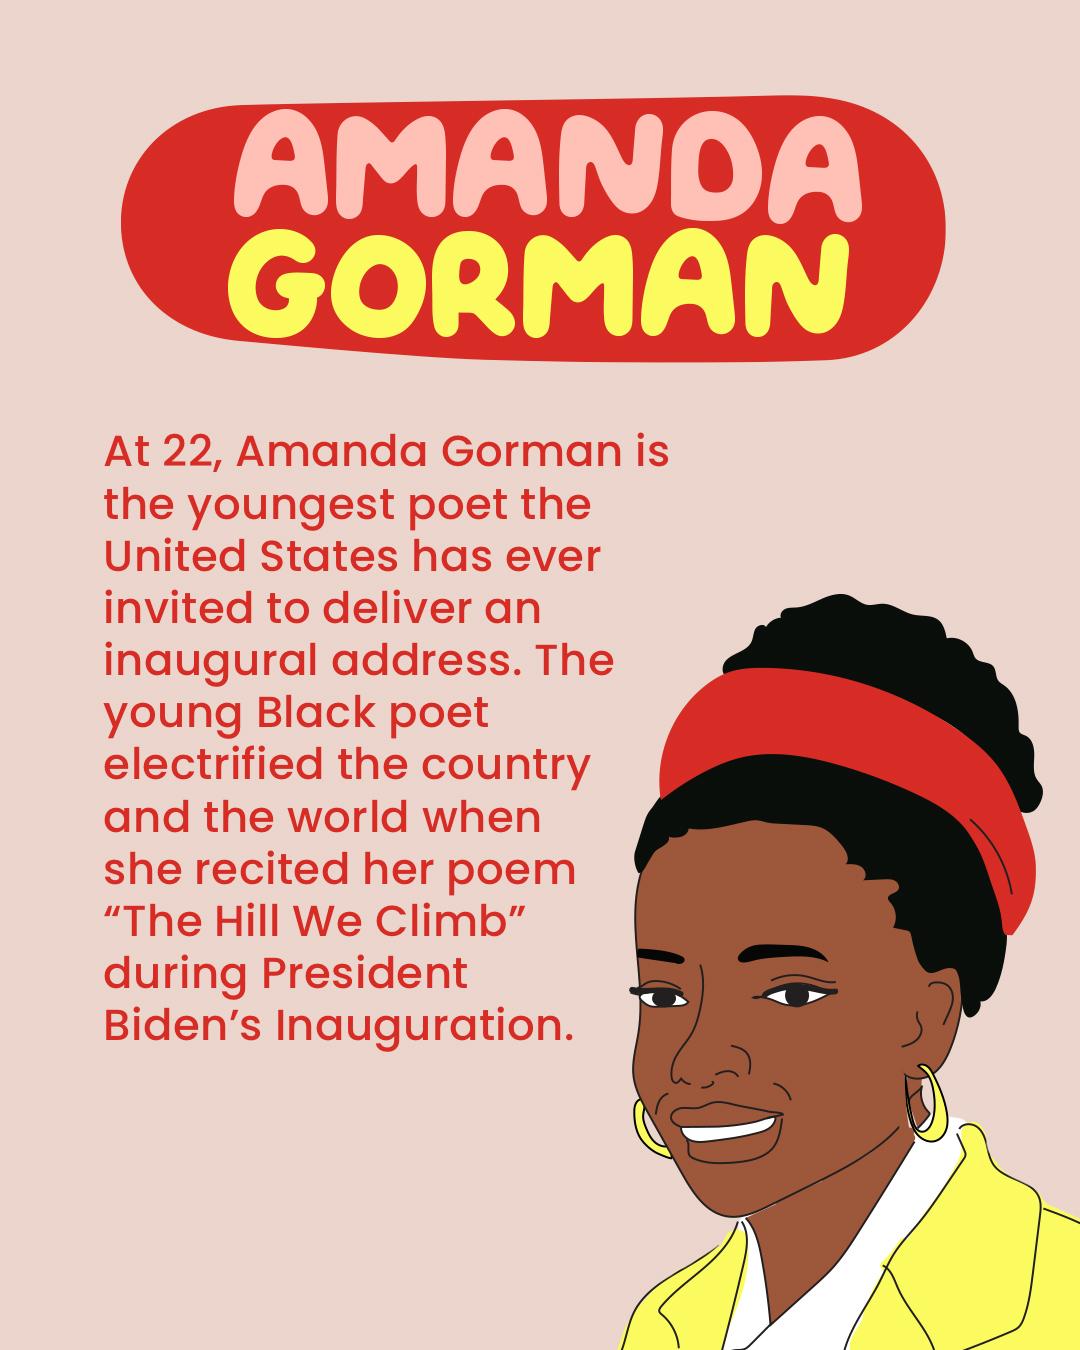 A picture of Amanda Gorman